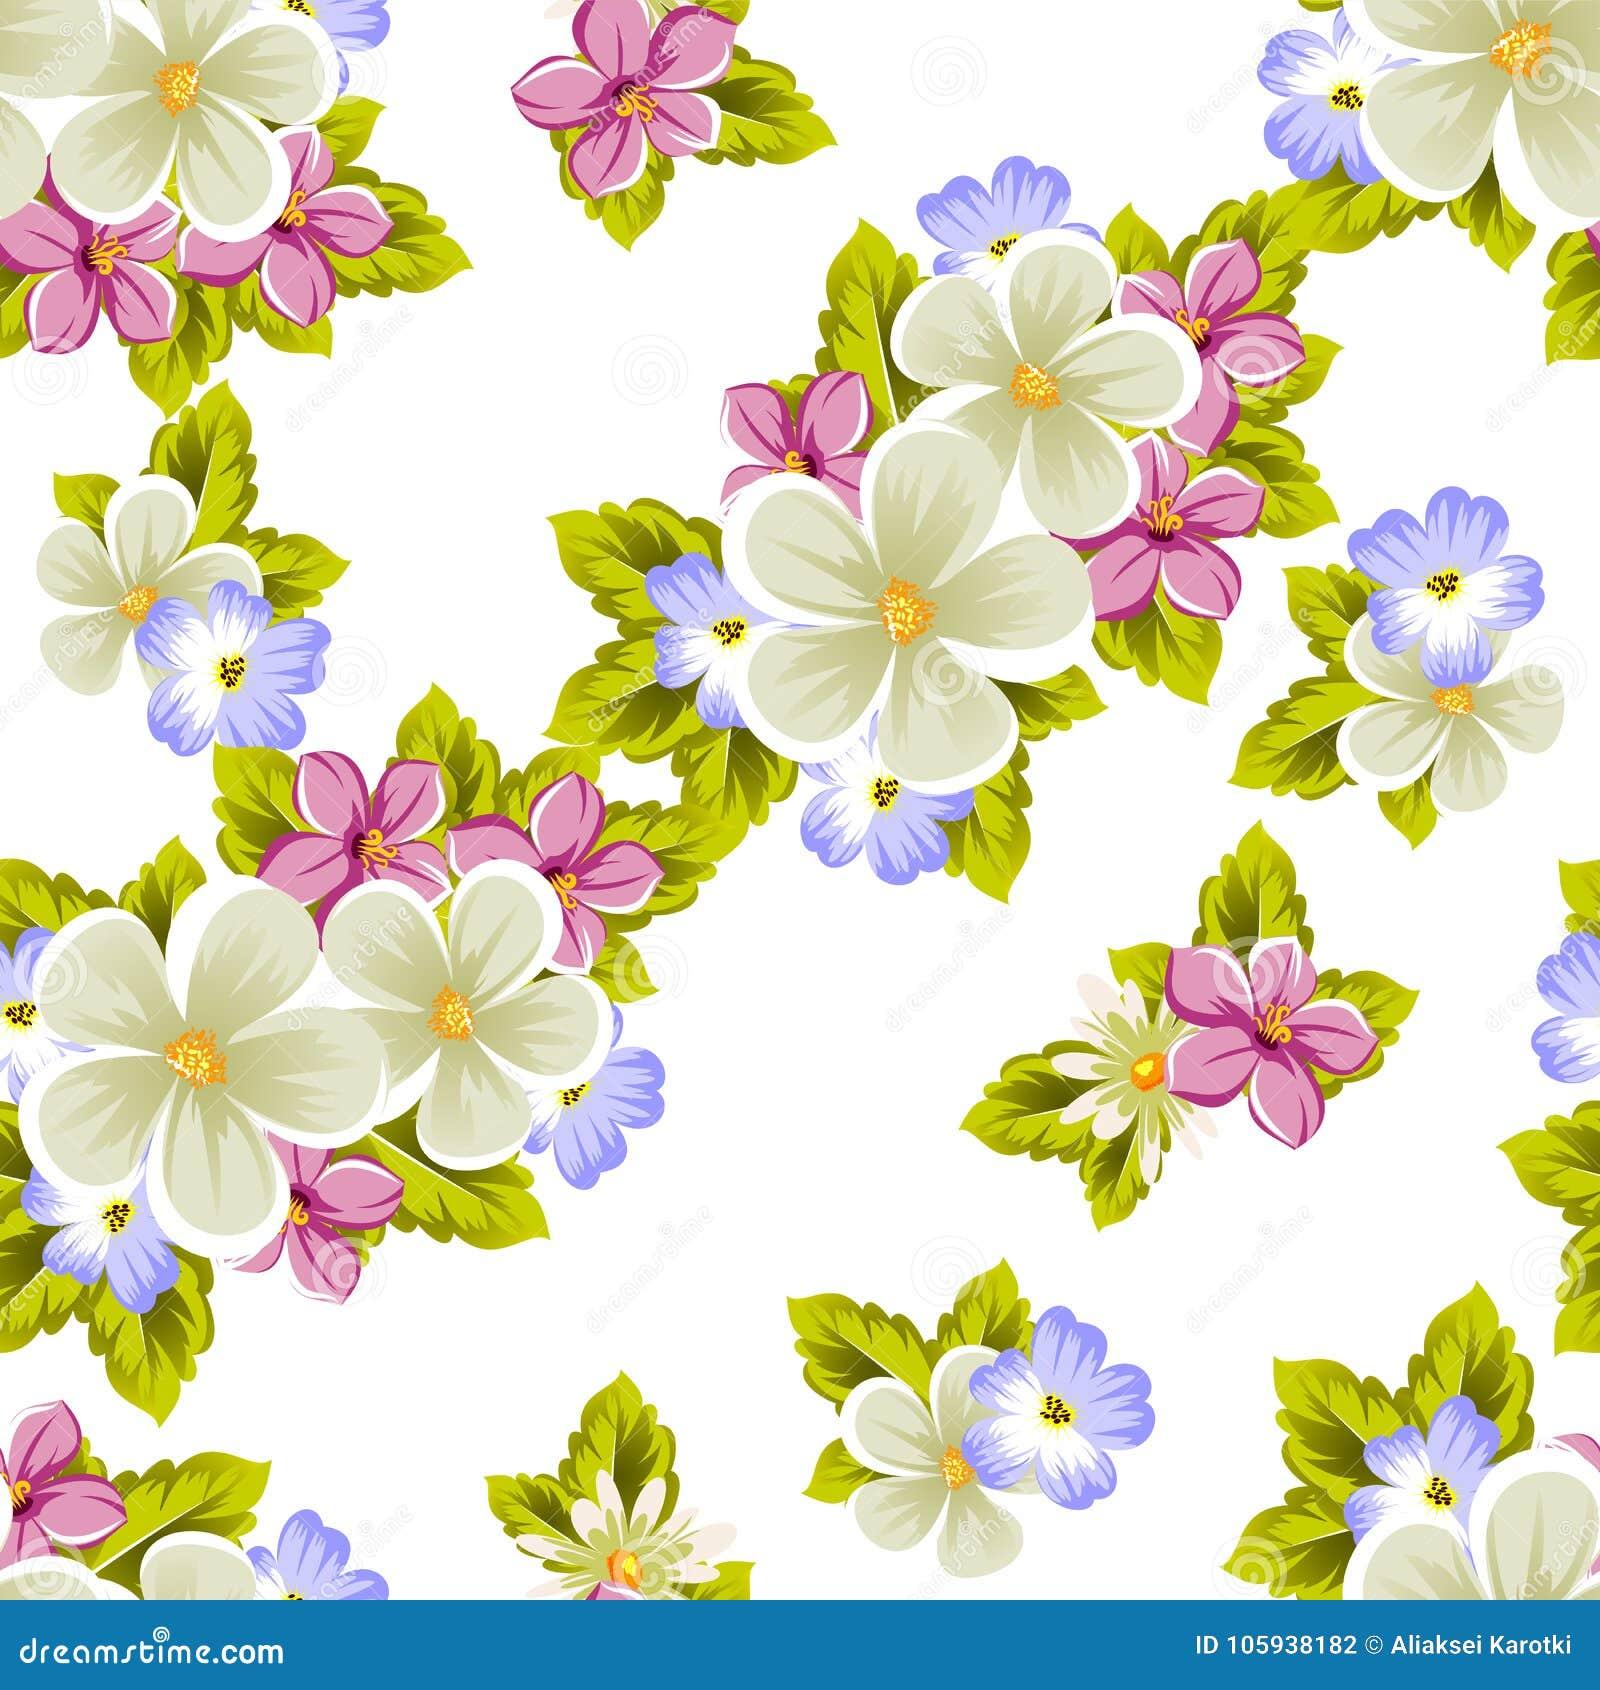 Modelo Inconsútil Floral De Varias Flores Para El Diseño De